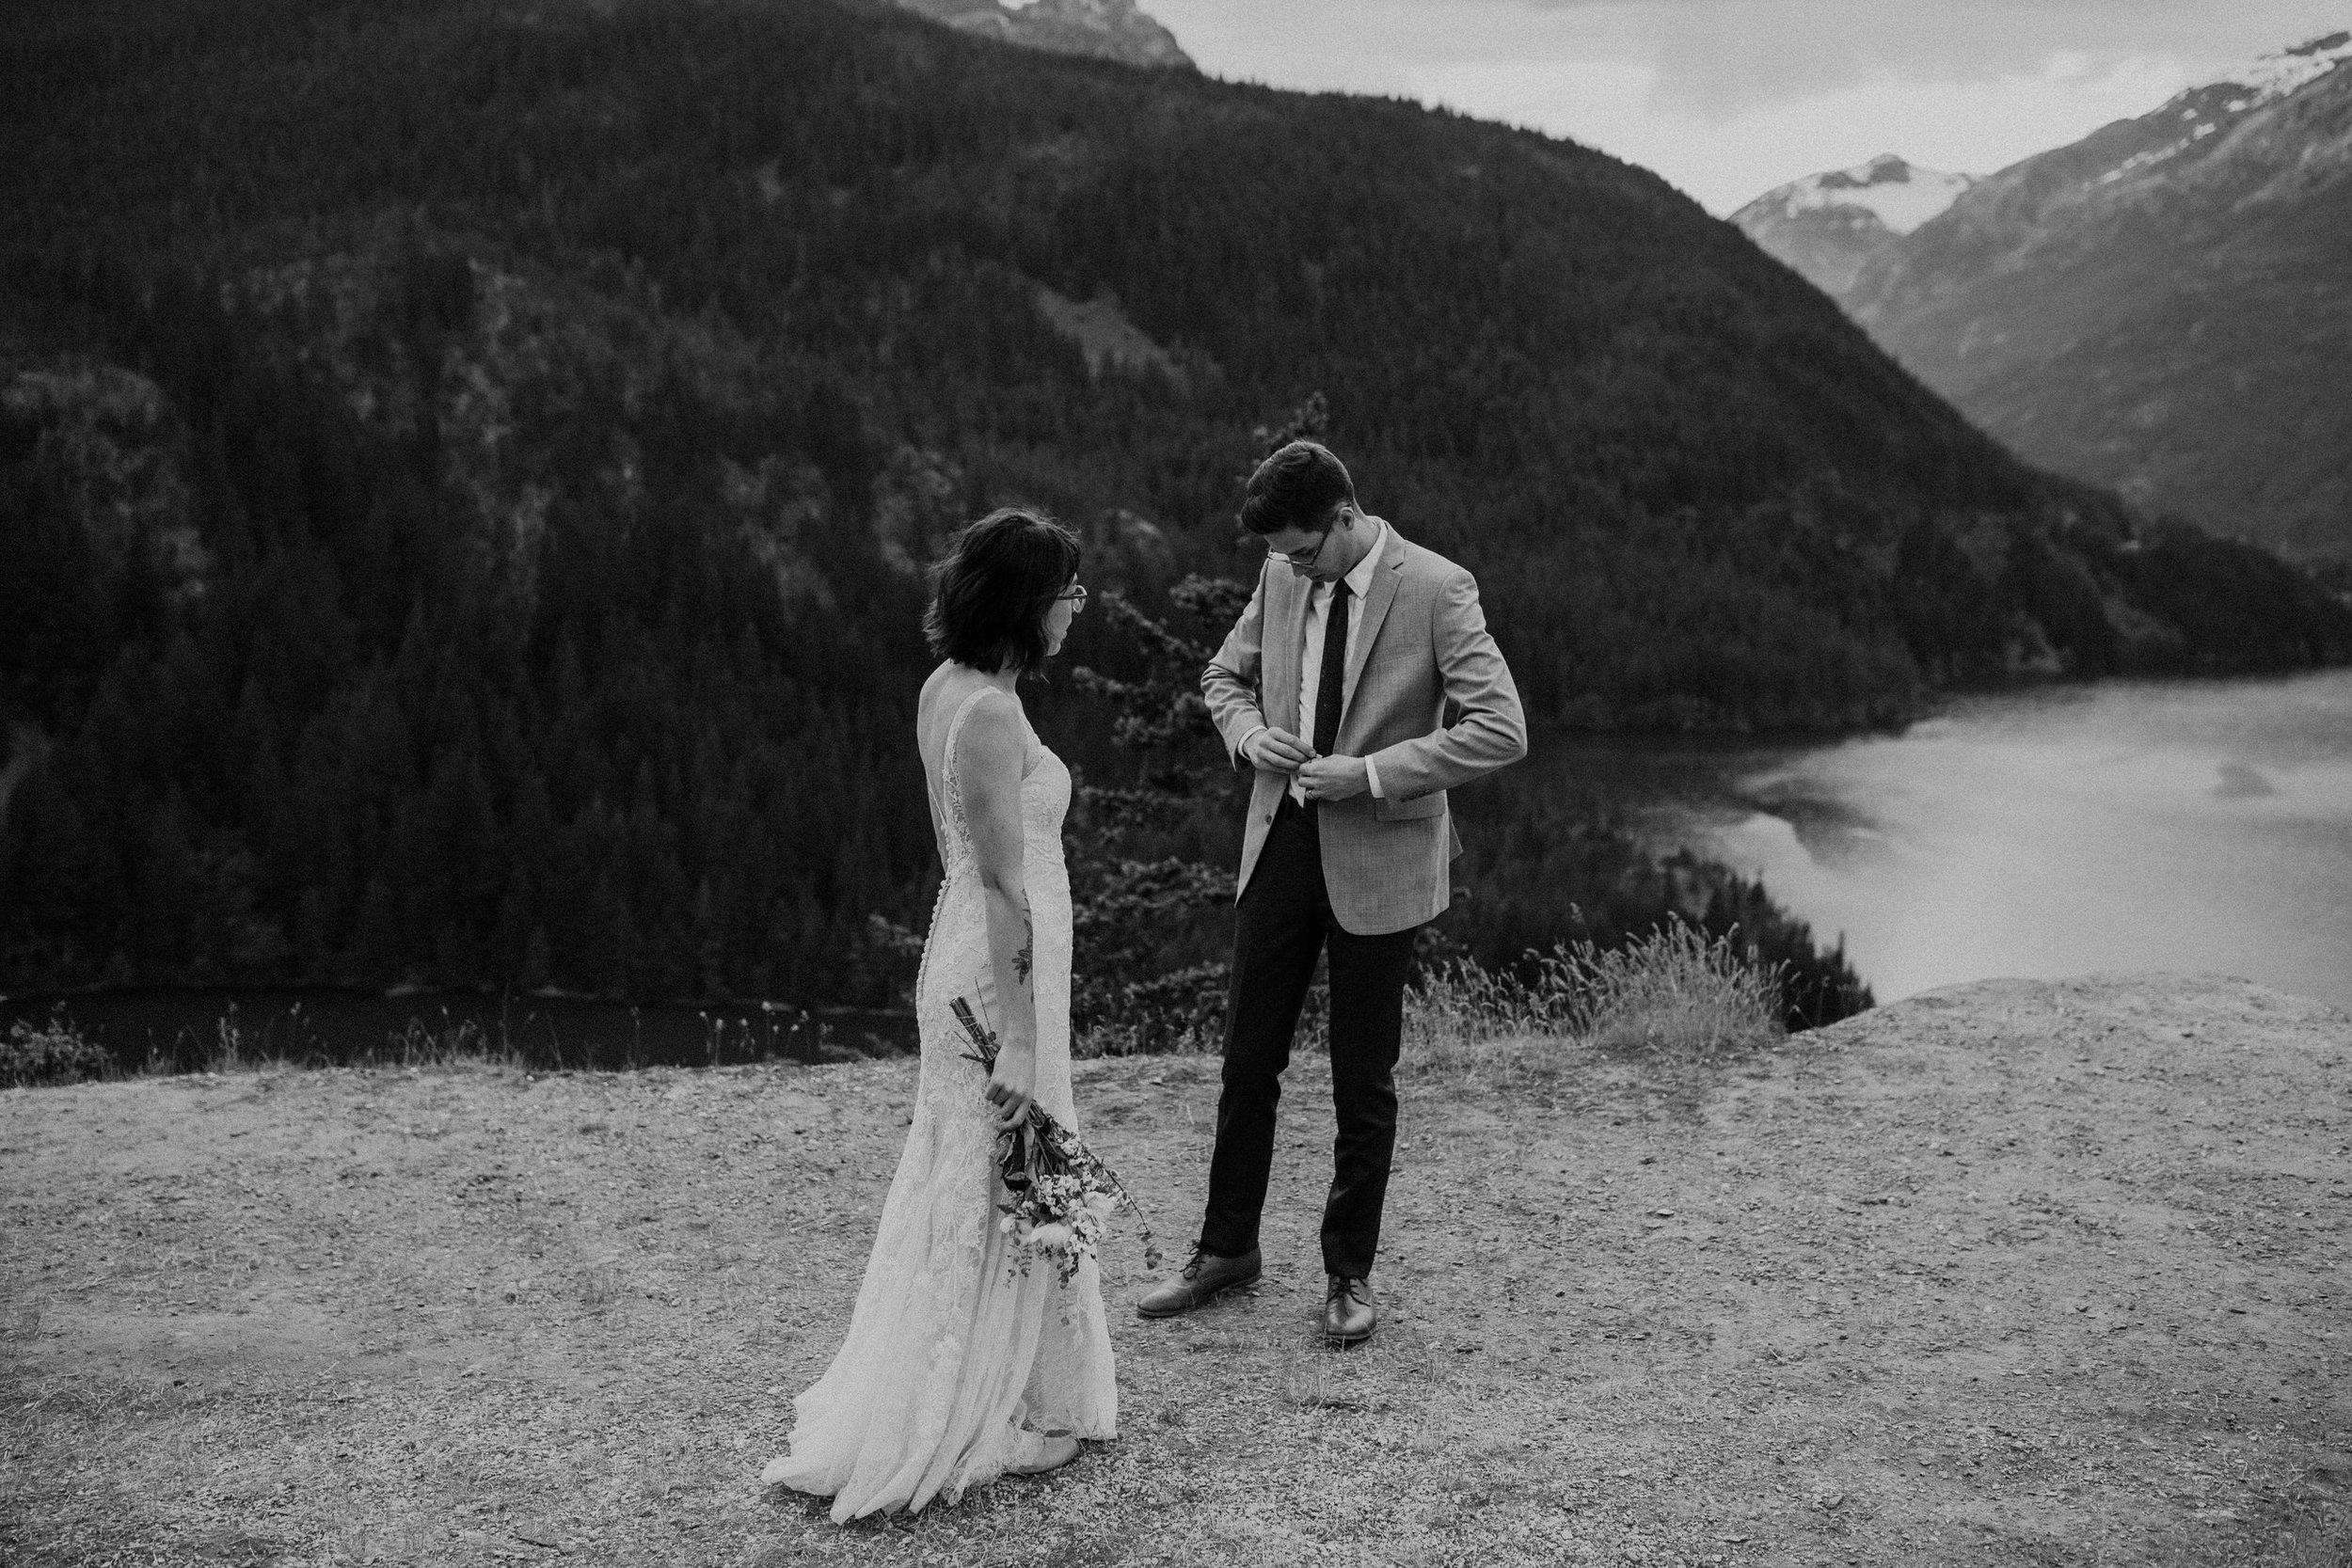 Ellie&Matt-wedding-seattle-diablolake14.jpg